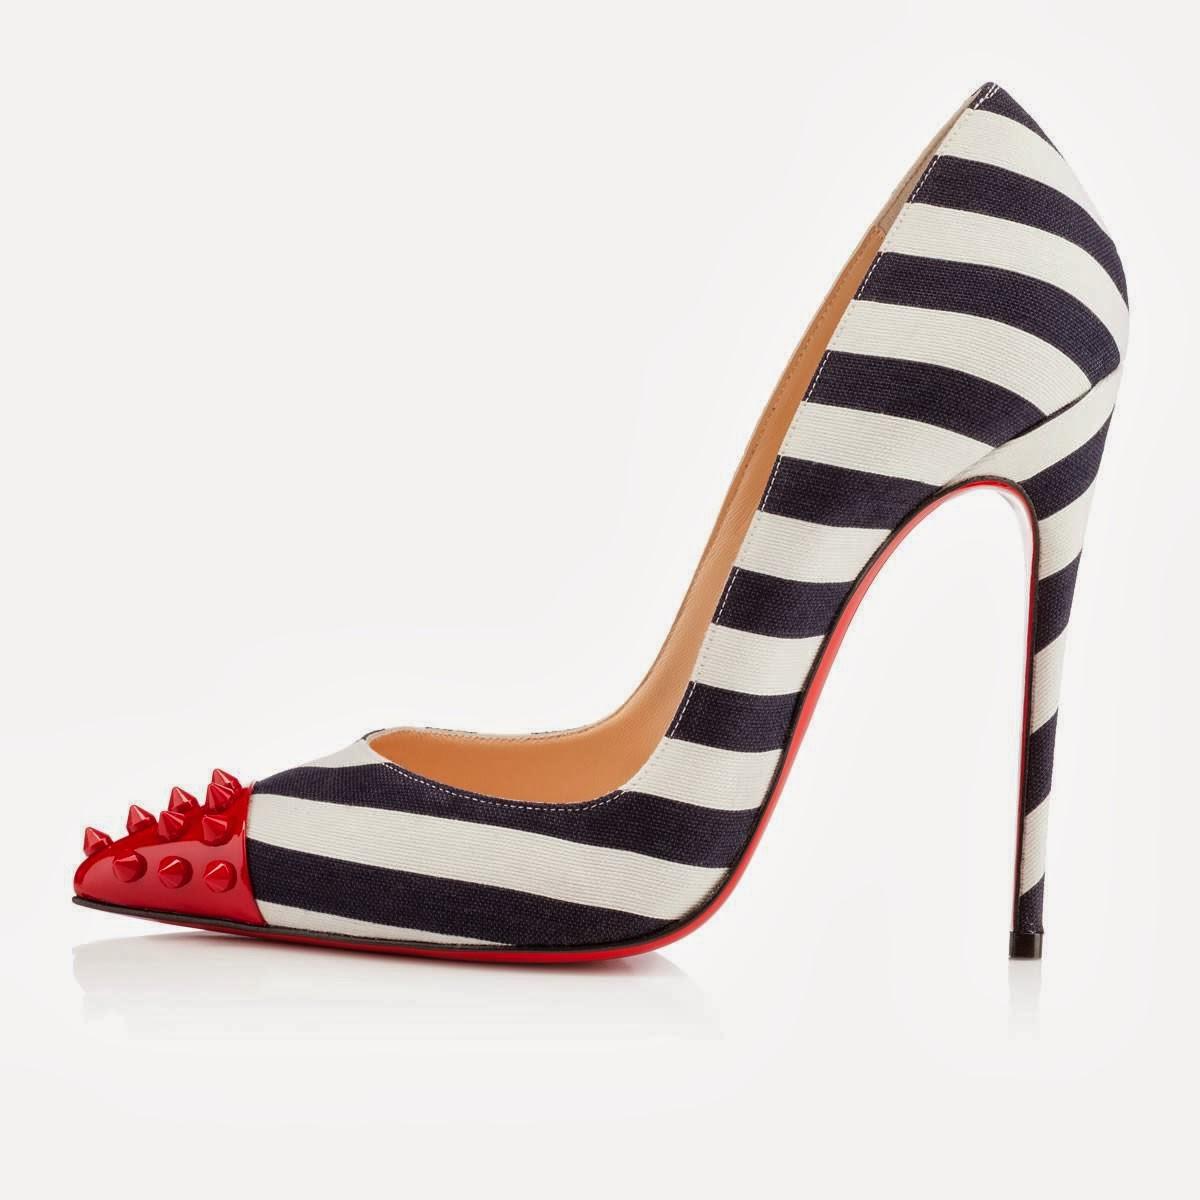 patent leather boat shoes men - Totalwrap: Christian Louboutin ��Geo Pump�� Navy Cotton Pumps